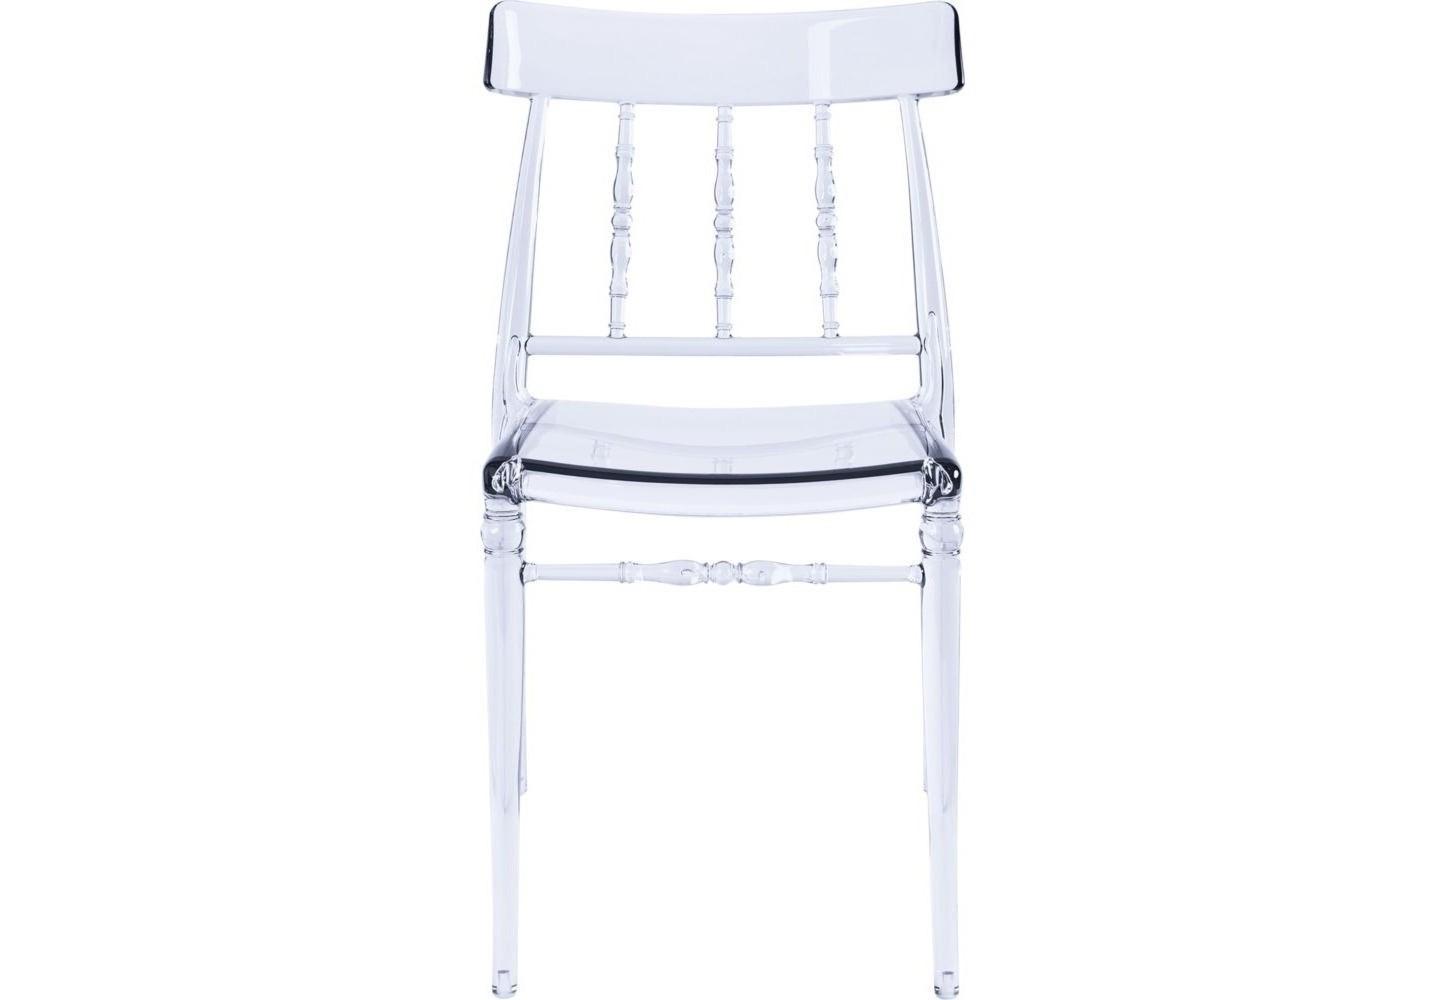 Стул CrystalОбеденные стулья<br><br><br>Material: Пластик<br>Ширина см: 46<br>Высота см: 84<br>Глубина см: 53